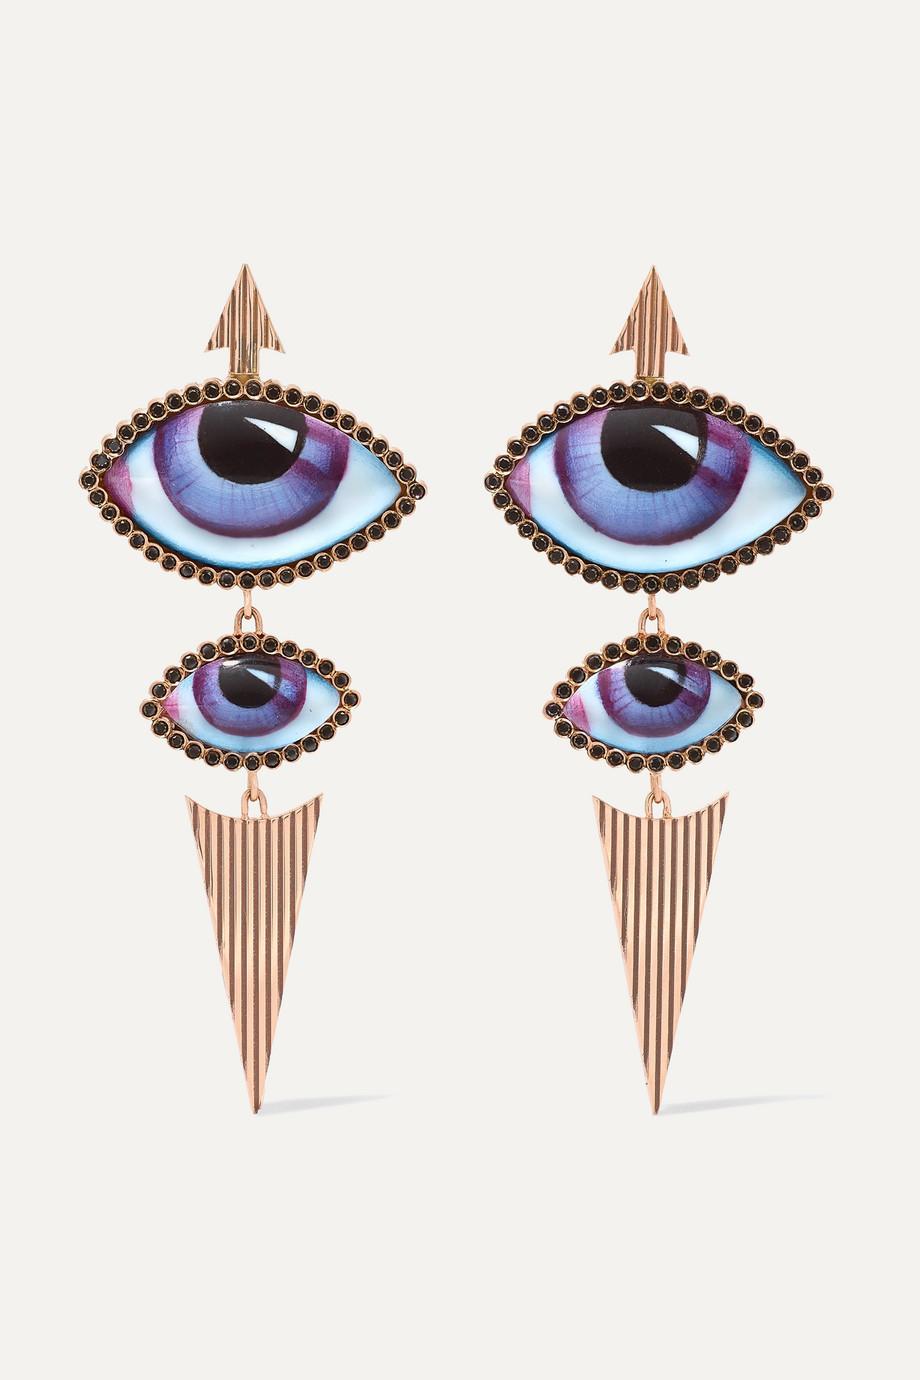 Lito Tu Es Partout Ohrringe aus 14 Karat Roségold mit Emaille und Diamanten